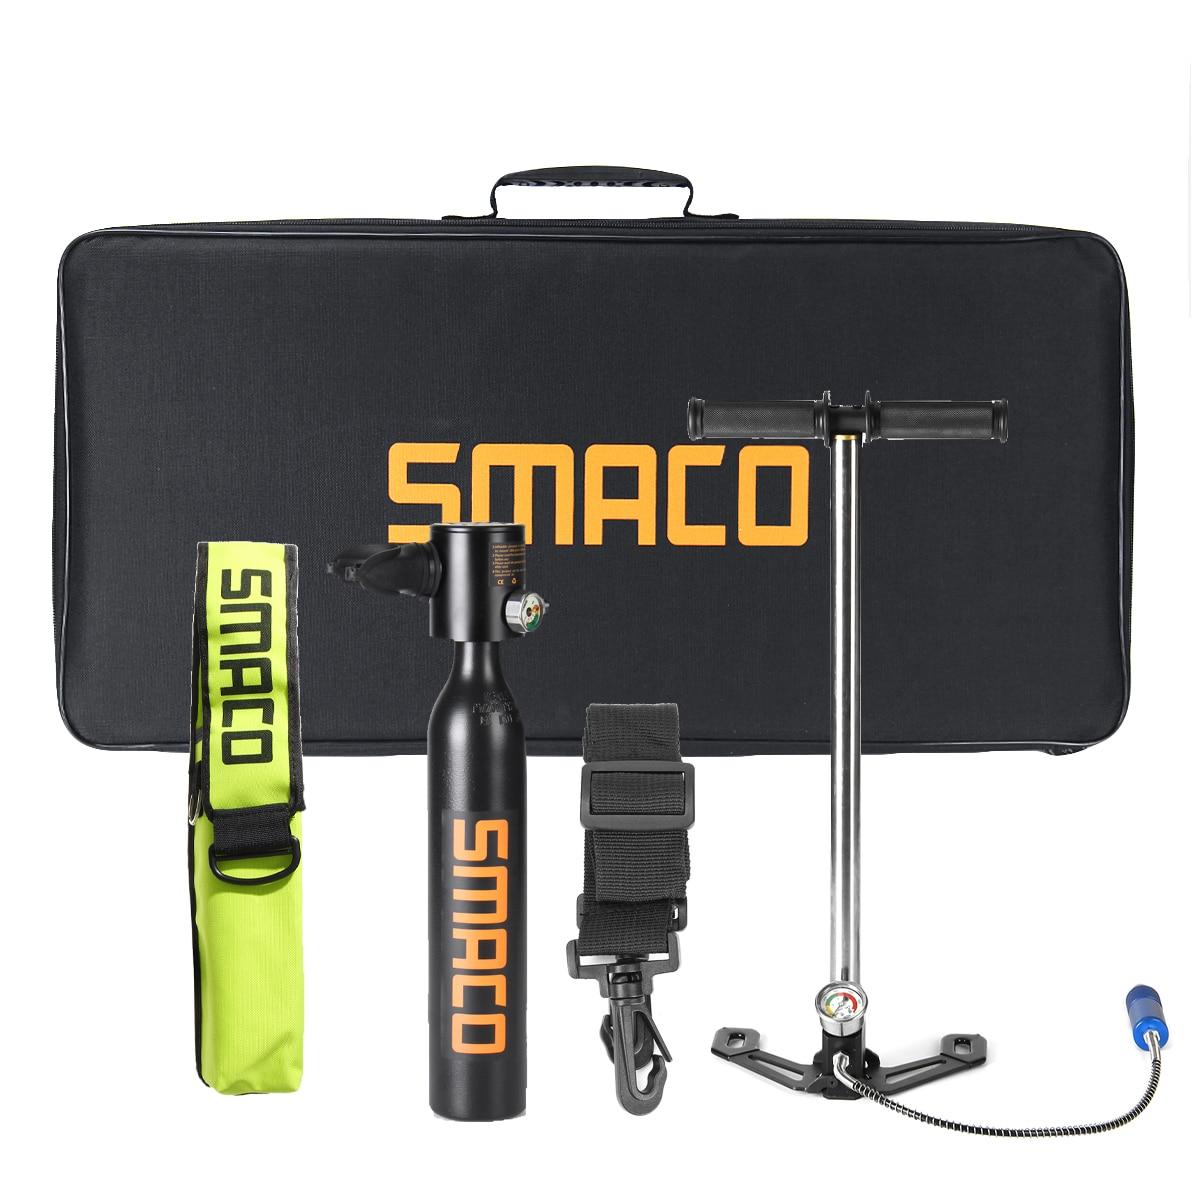 SMACO Underwater Breathing Accessories/Set 0.5L Diving Equipment Mini Scuba Diving Cylinder Scuba Oxygen Tank Pump Bag